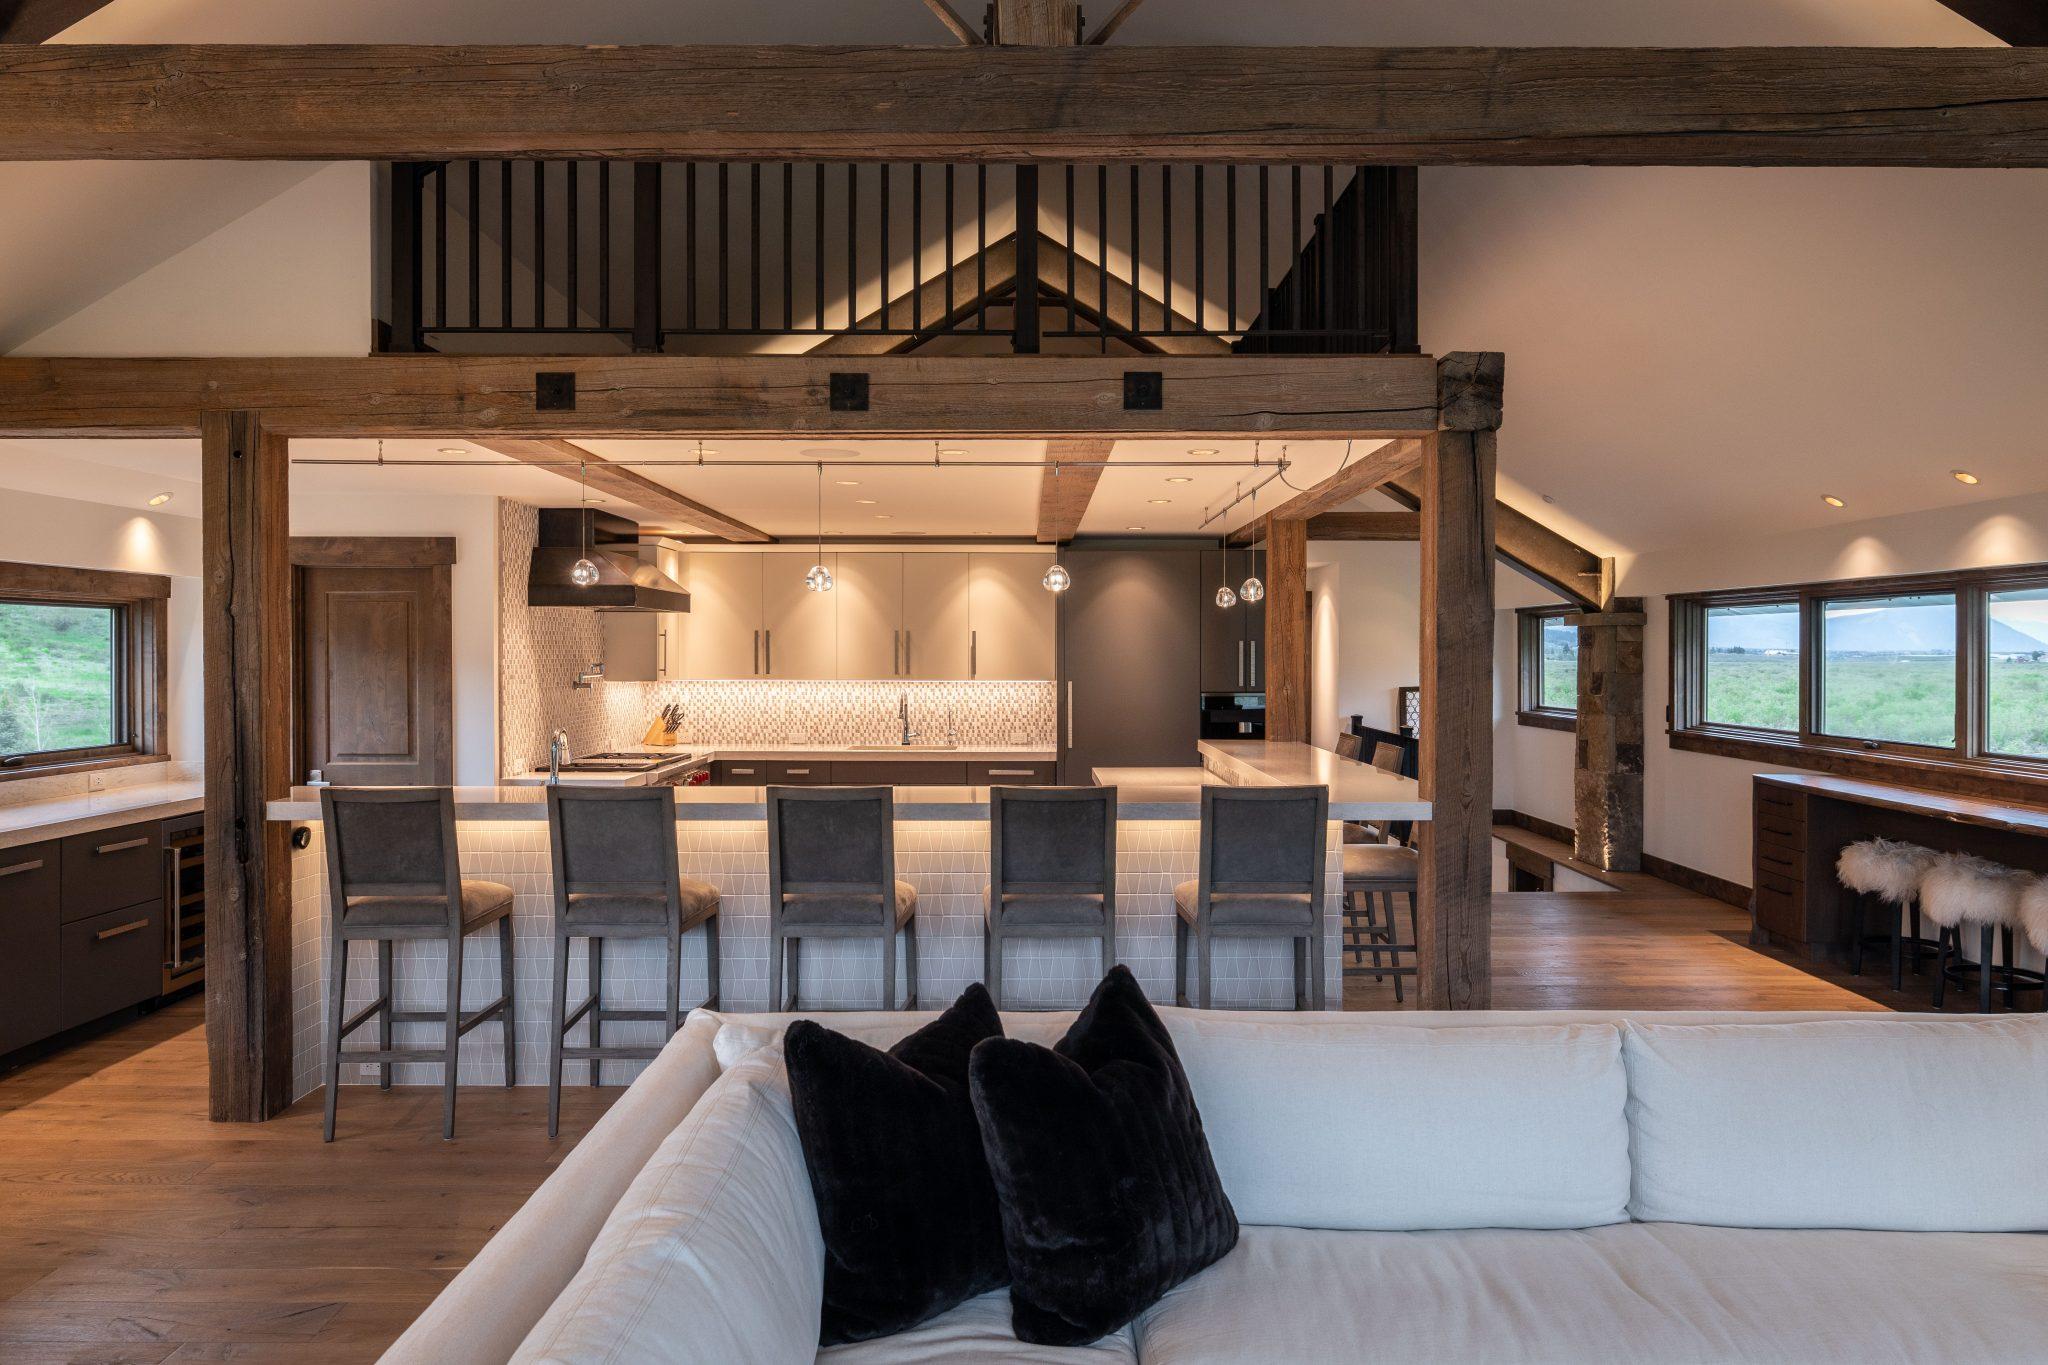 Somrak Concept and Structure – Crested Butte Home Builder - Slate River Remodel